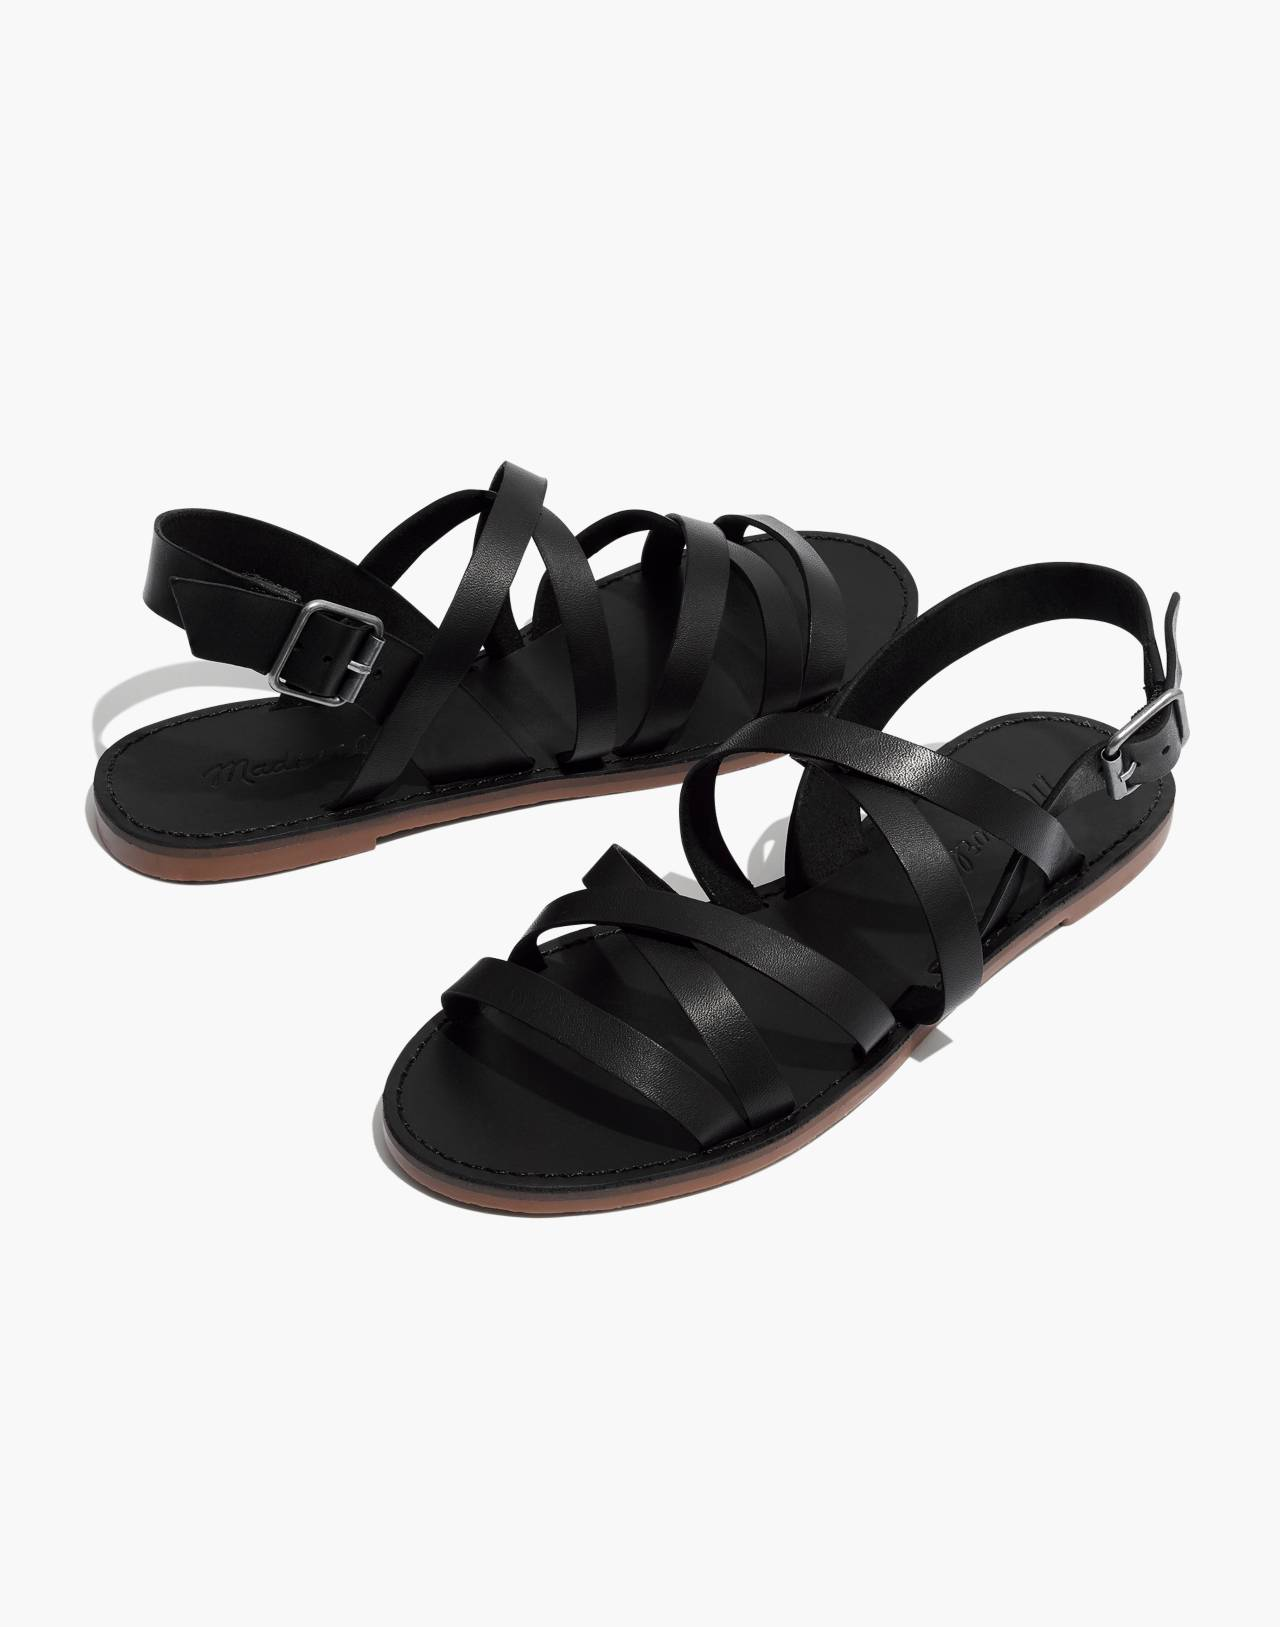 The Boardwalk Multistrap Sandal in true black image 1